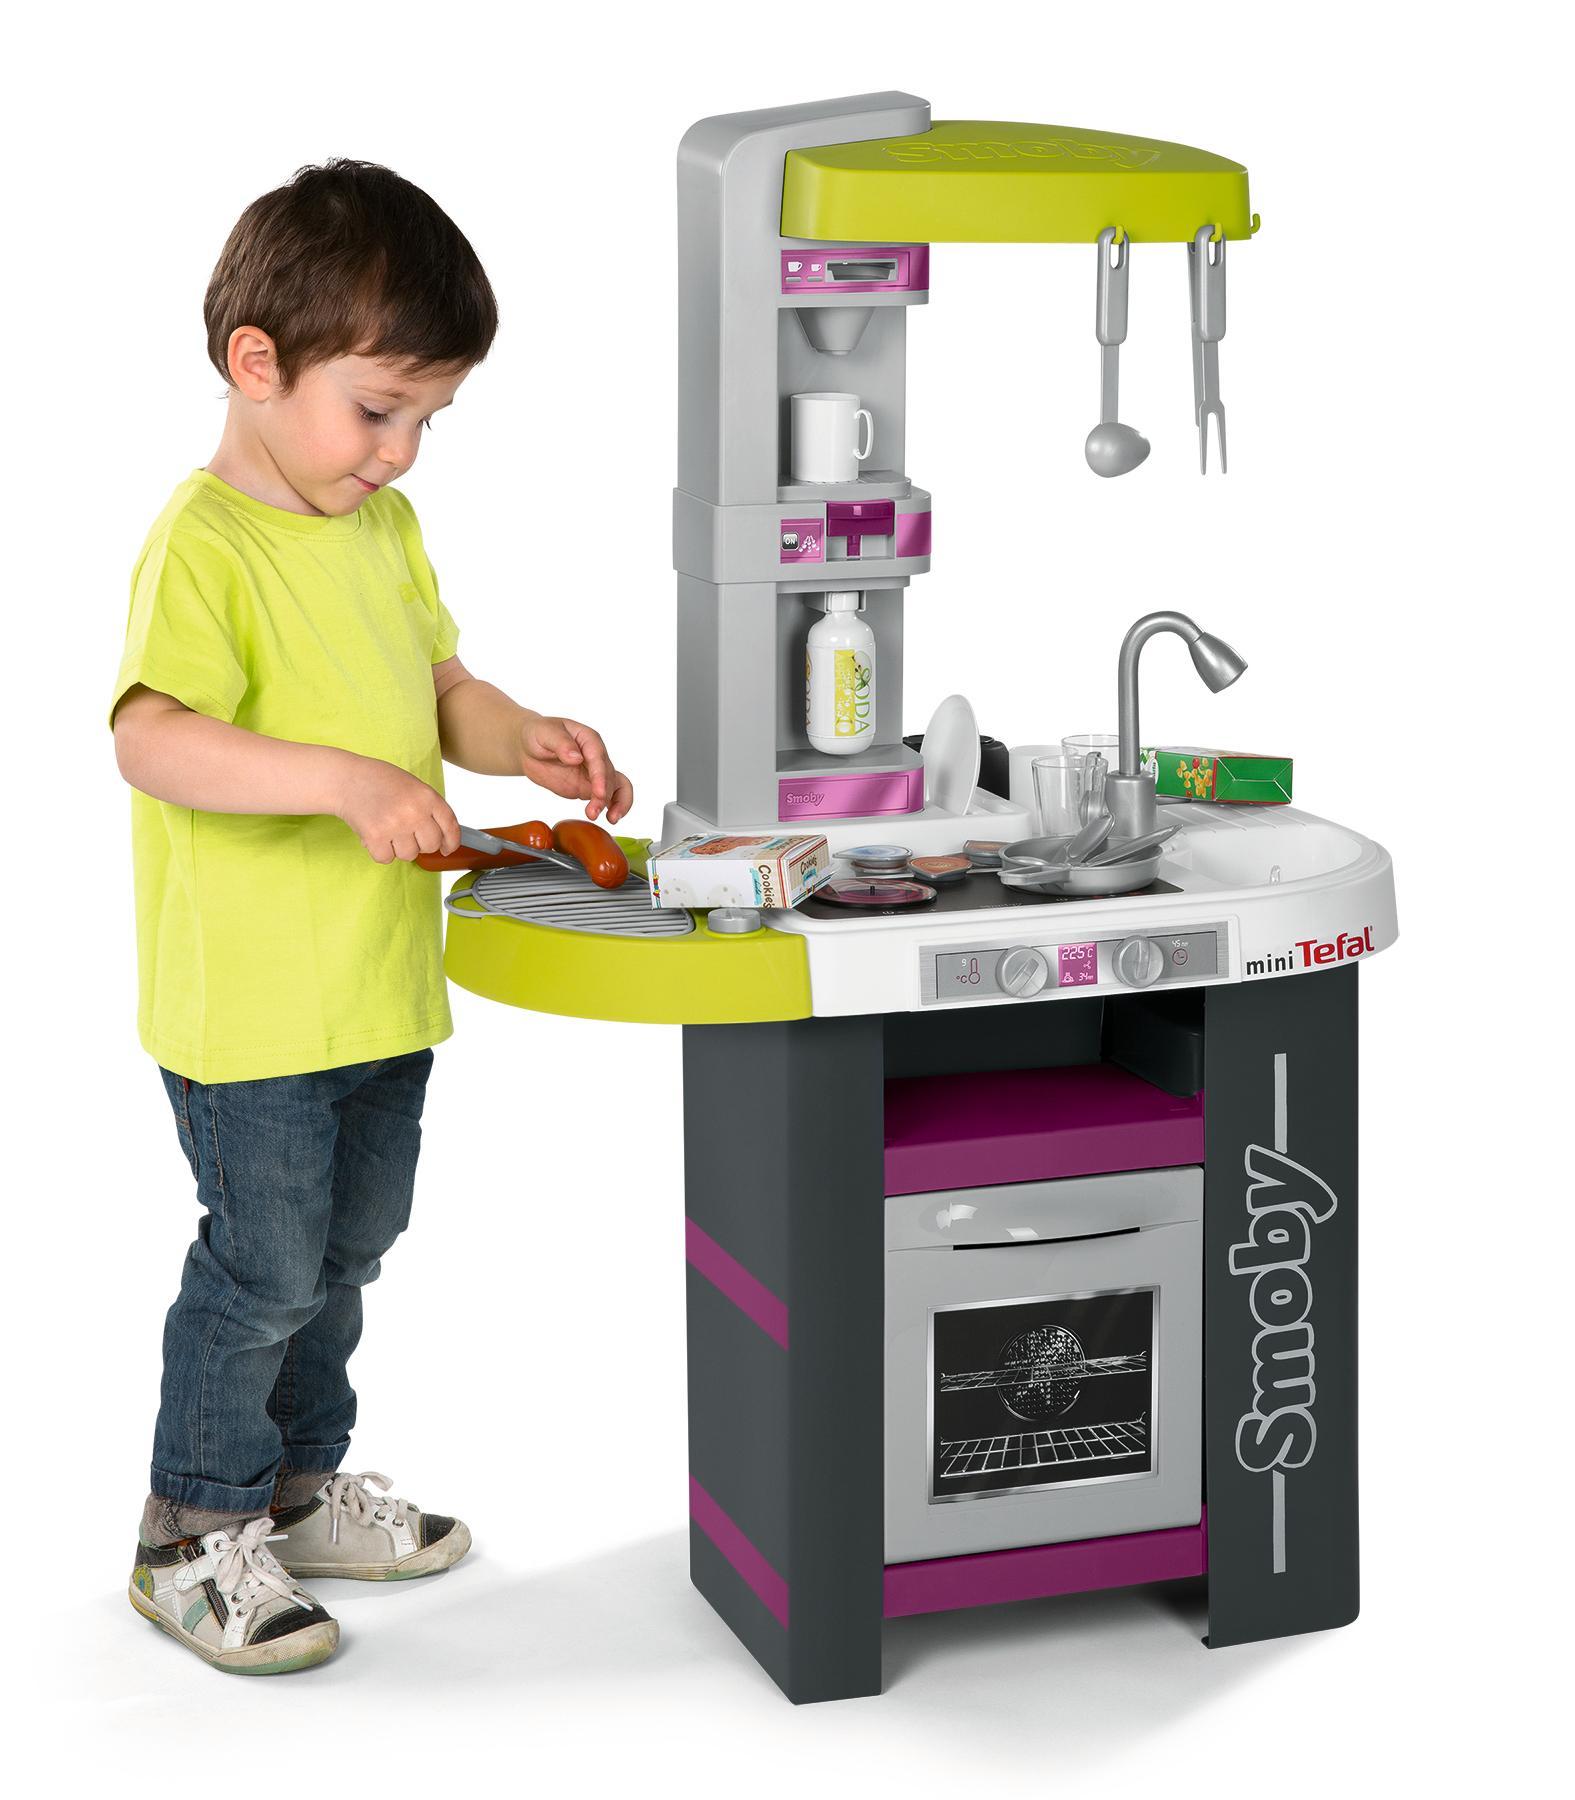 smoby 24128 - tefal studio küche barbecue: amazon.de: spielzeug - Smoby Küche Tefal